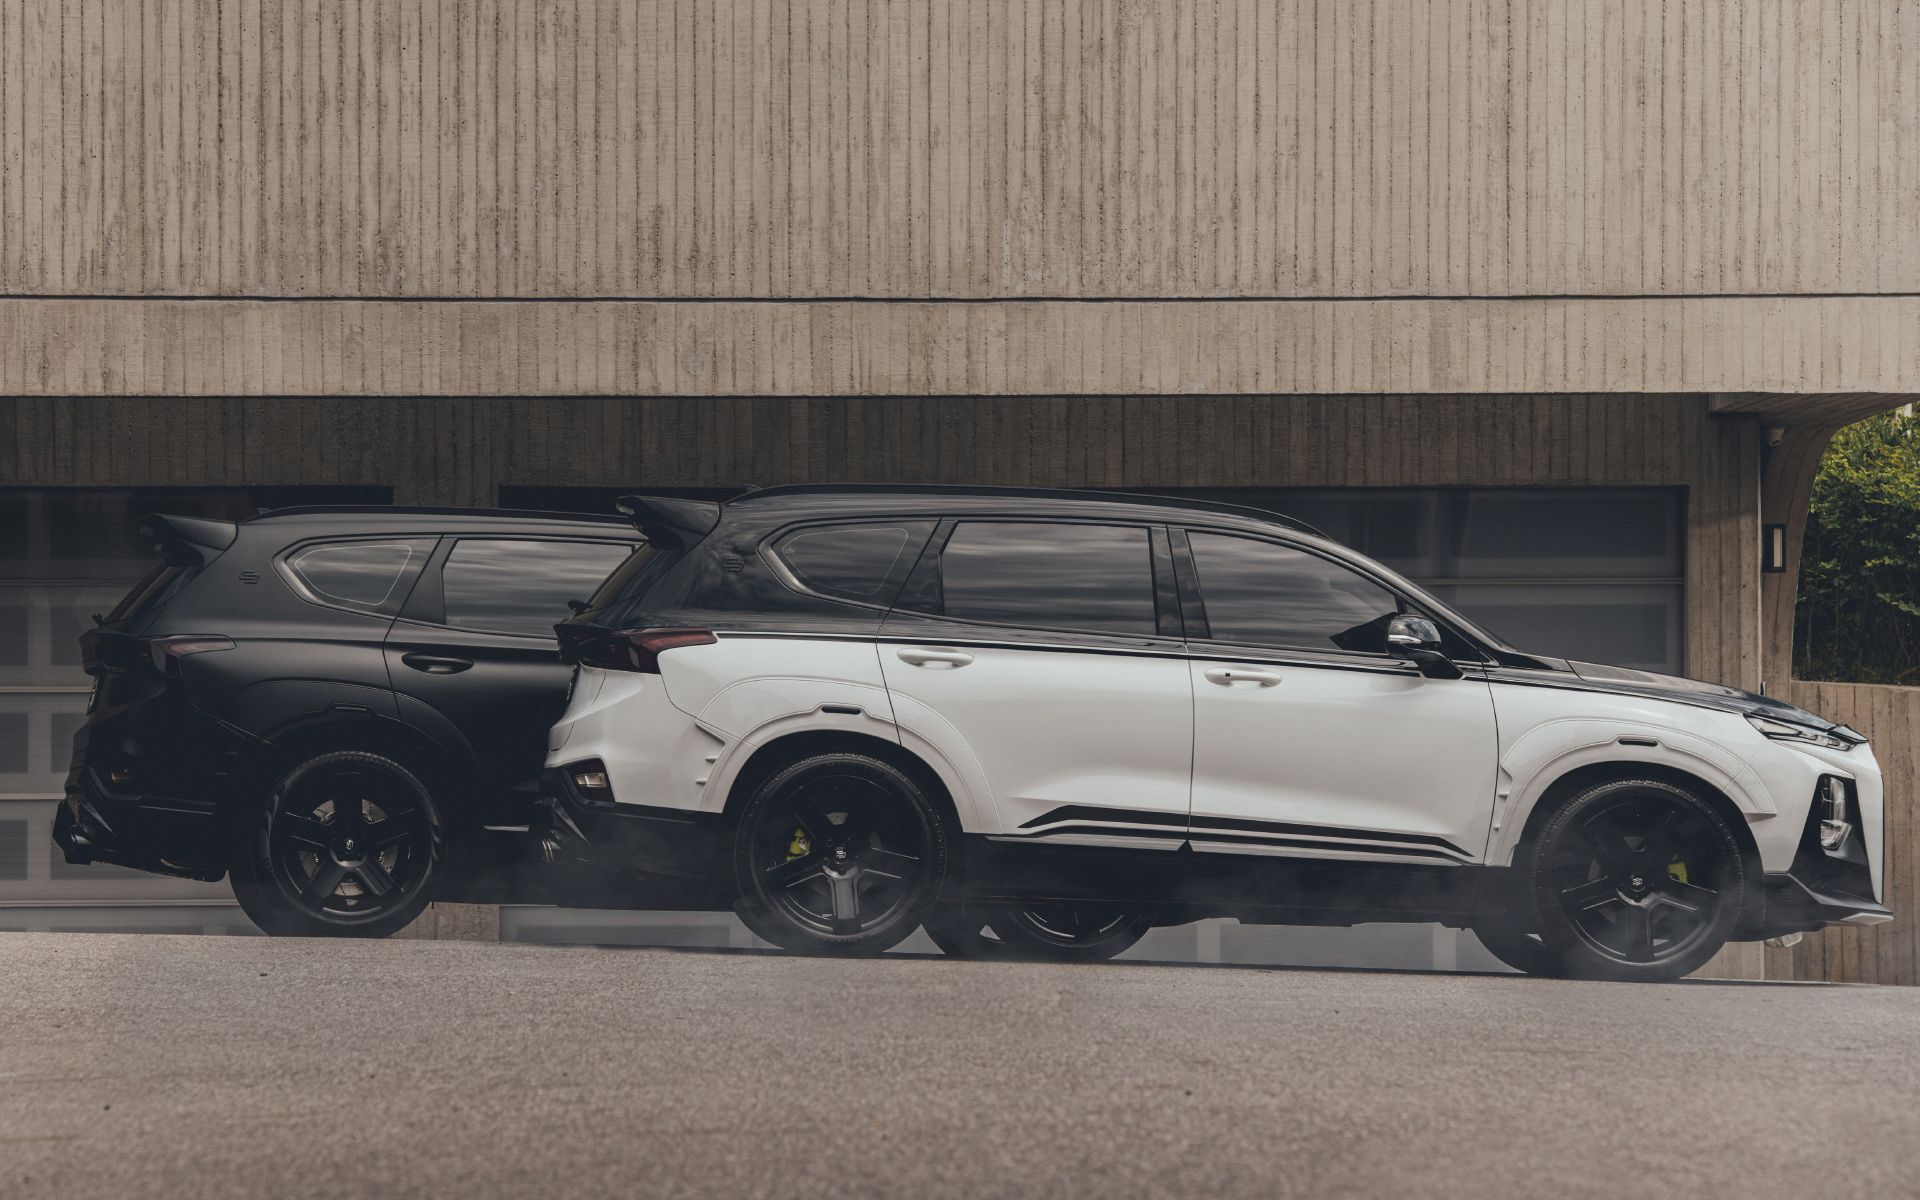 Hyundai-Santa-Fe-by-Carlex-Design-30